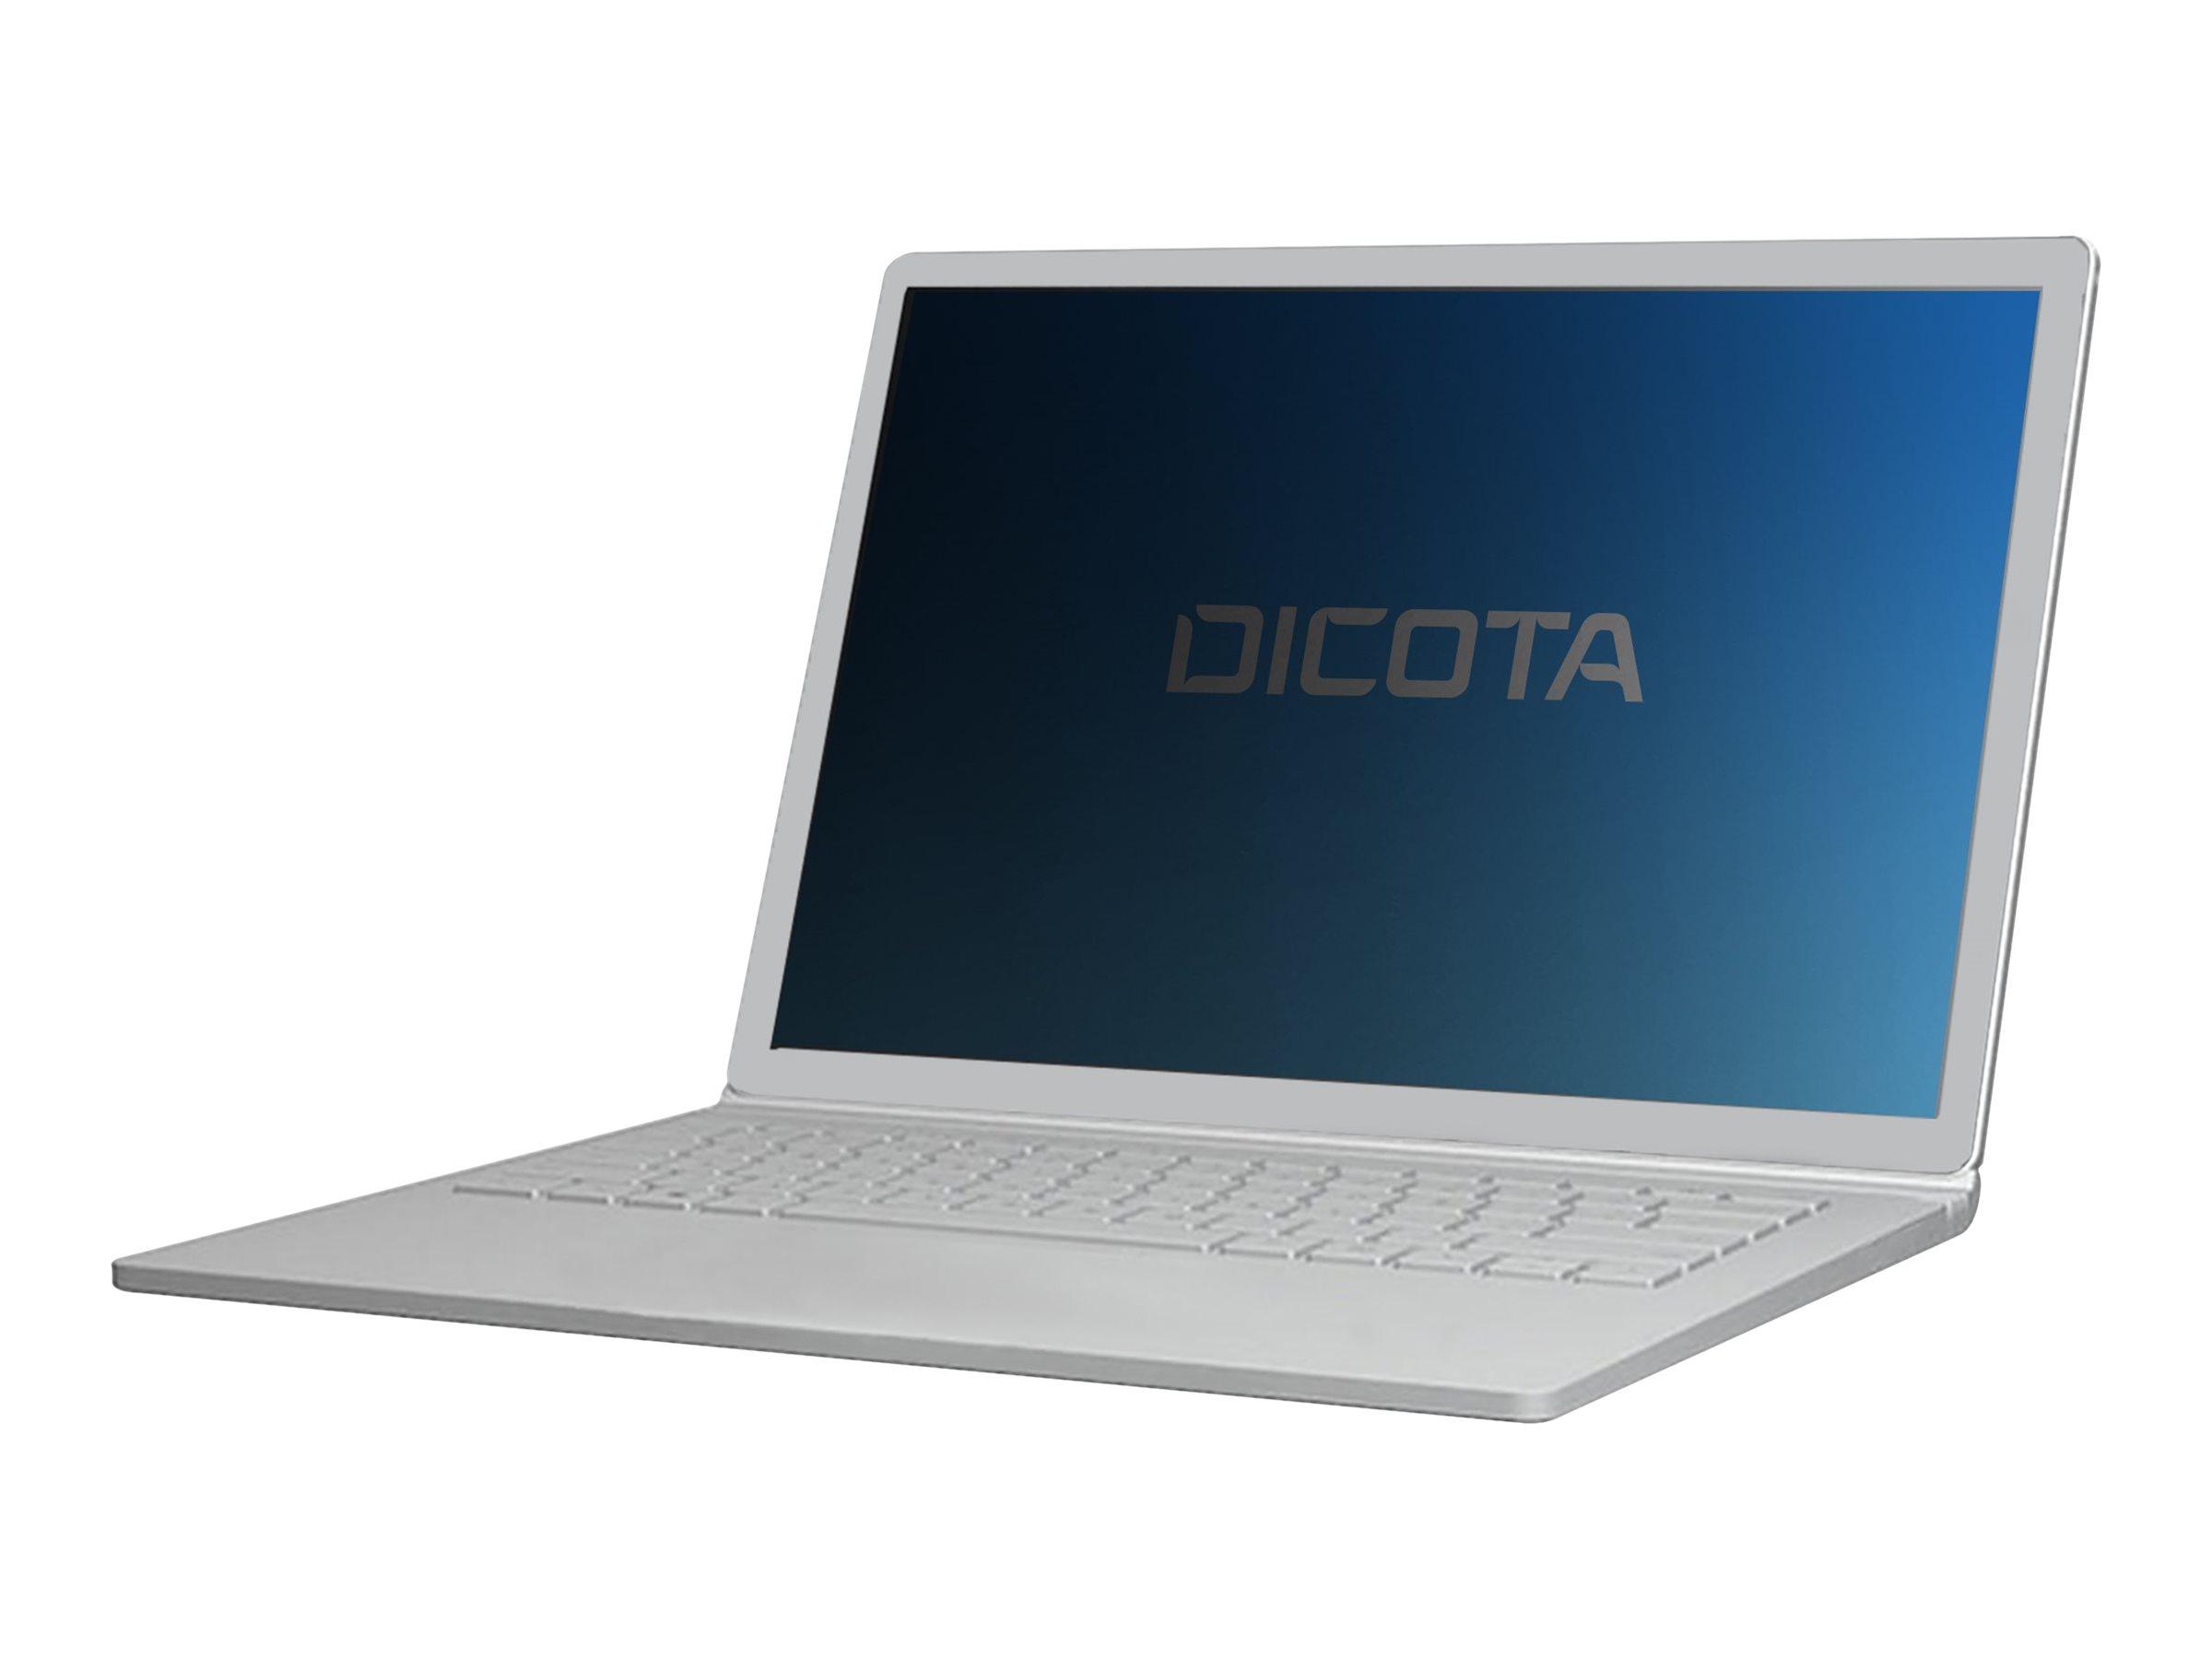 Vorschau: Dicota Blickschutzfilter für Notebook - 2-Wege